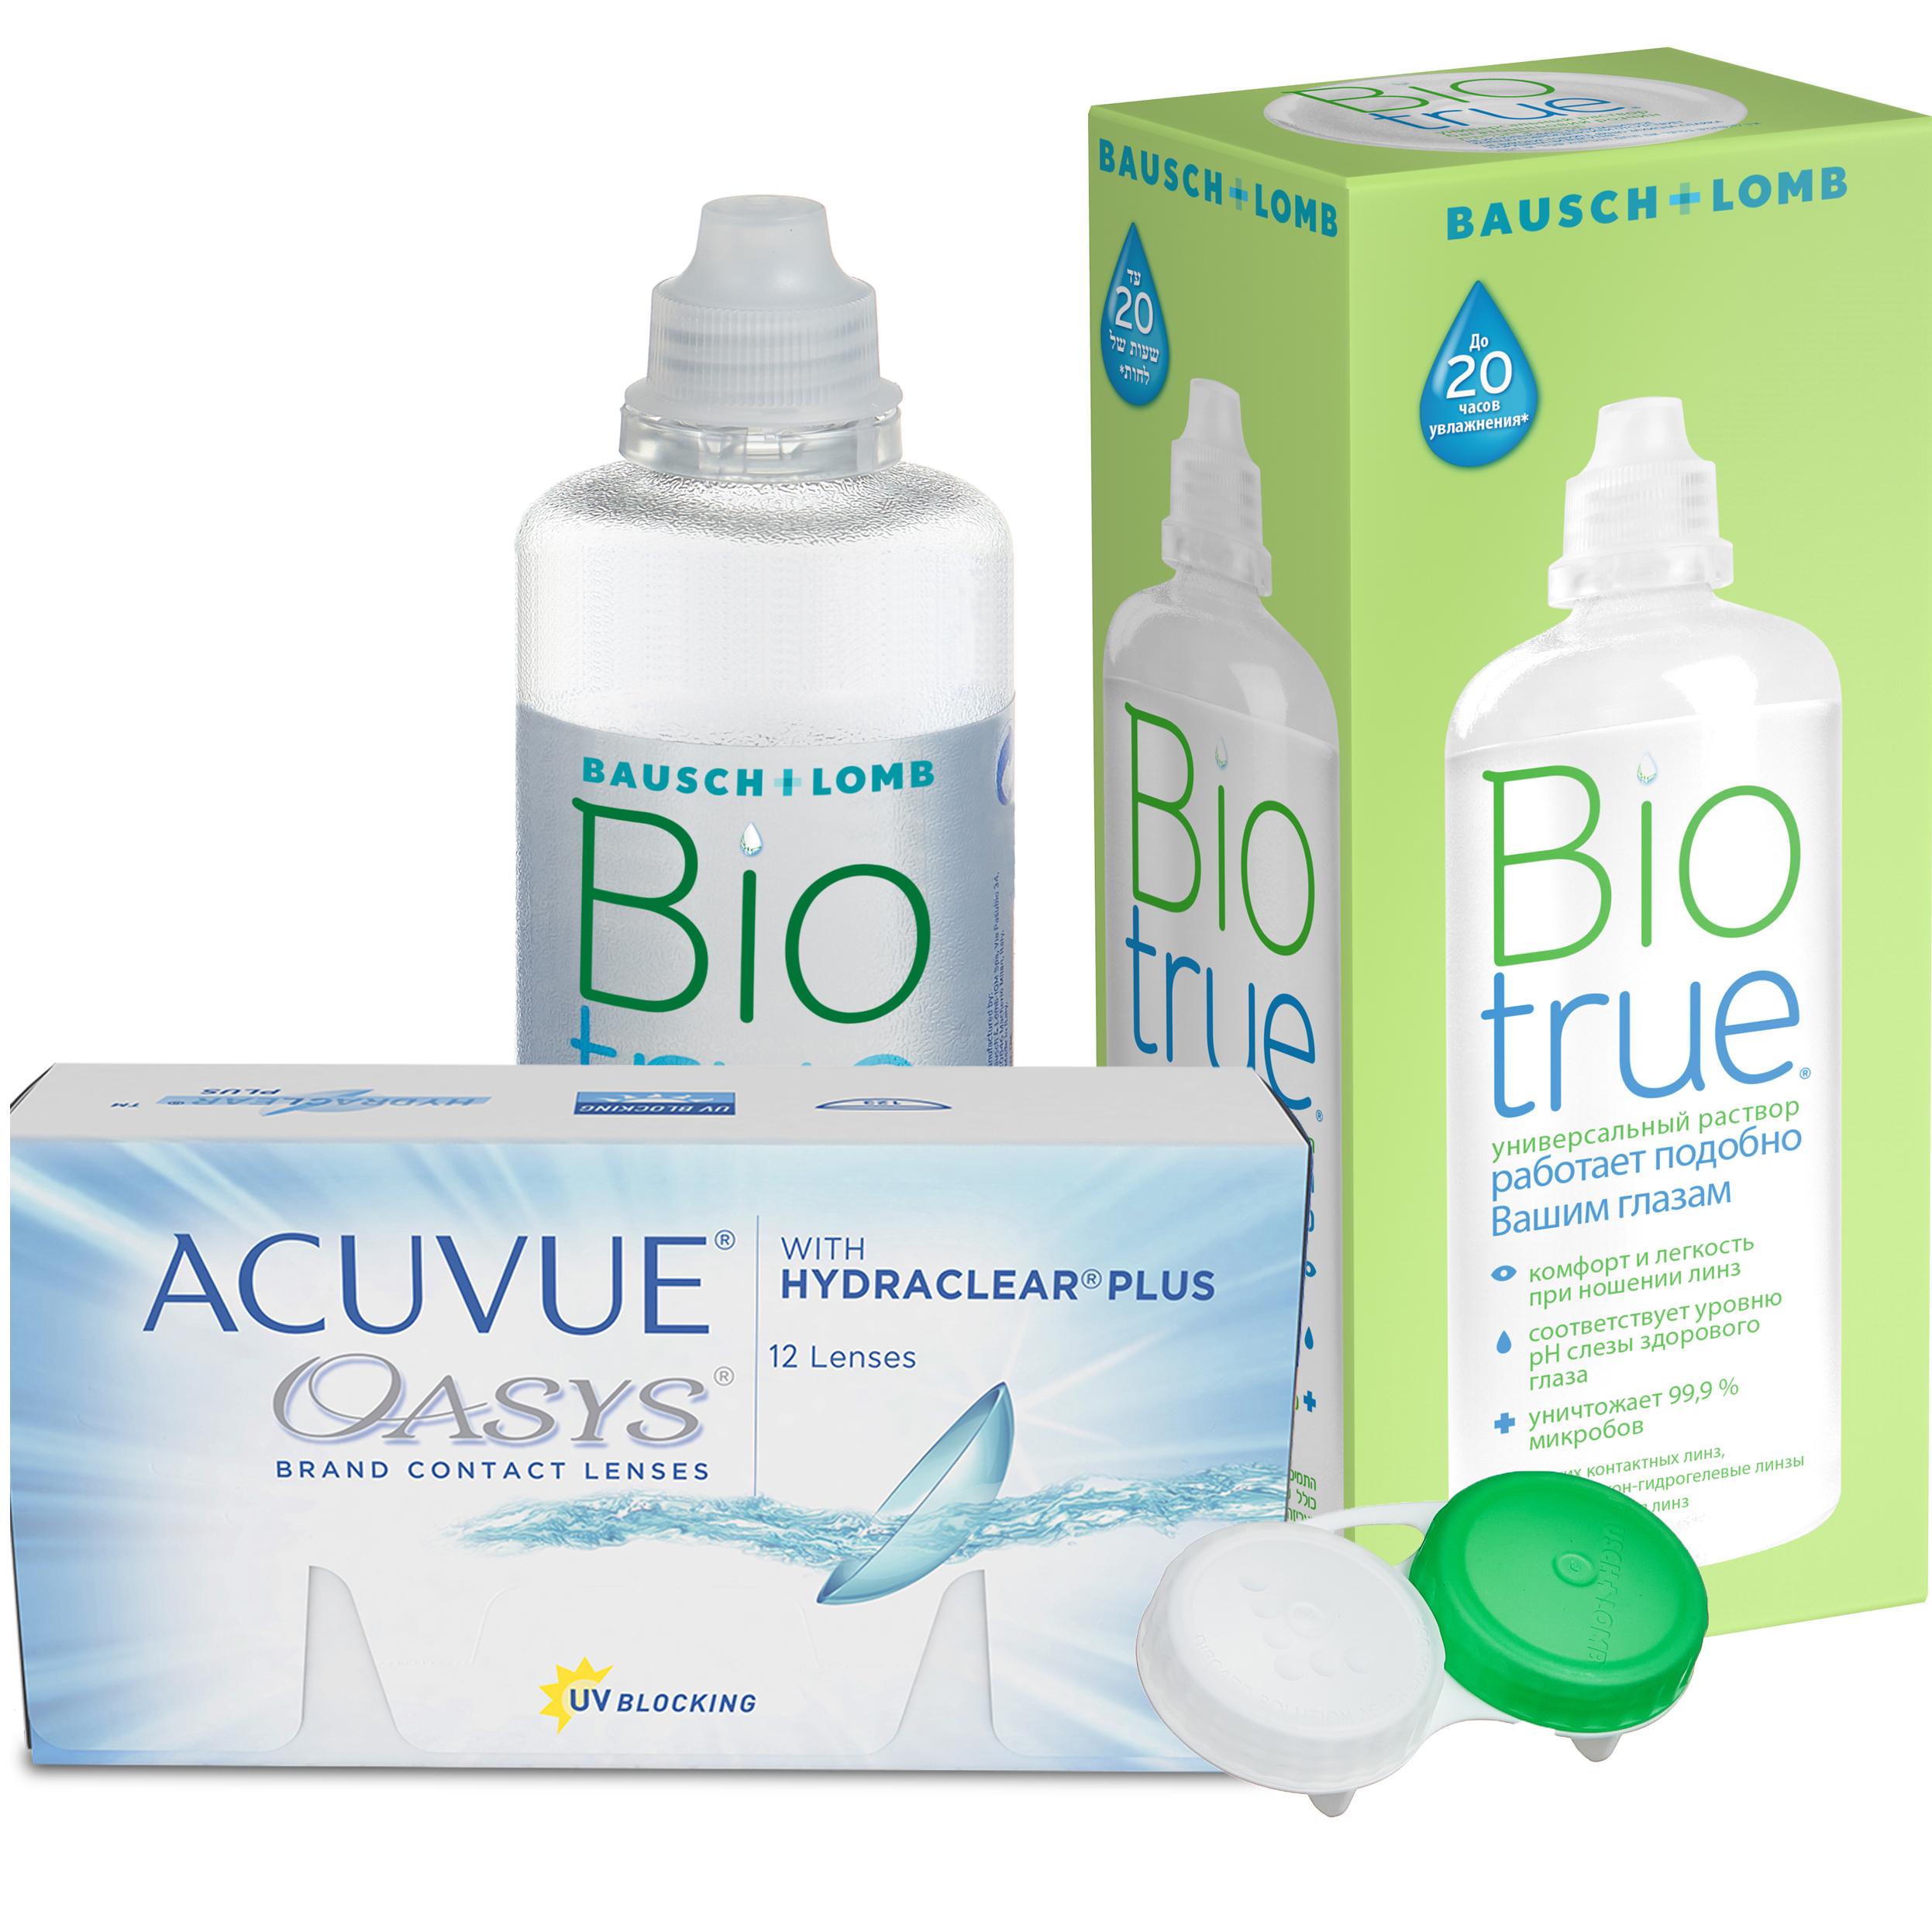 Купить Oasys with Hydraclear Plus 12 линз + Biotrue, Контактные линзы Acuvue Oasys with Hydraclear Plus 12 линз R 8.4 -0, 75 + Biotrue 300 мл